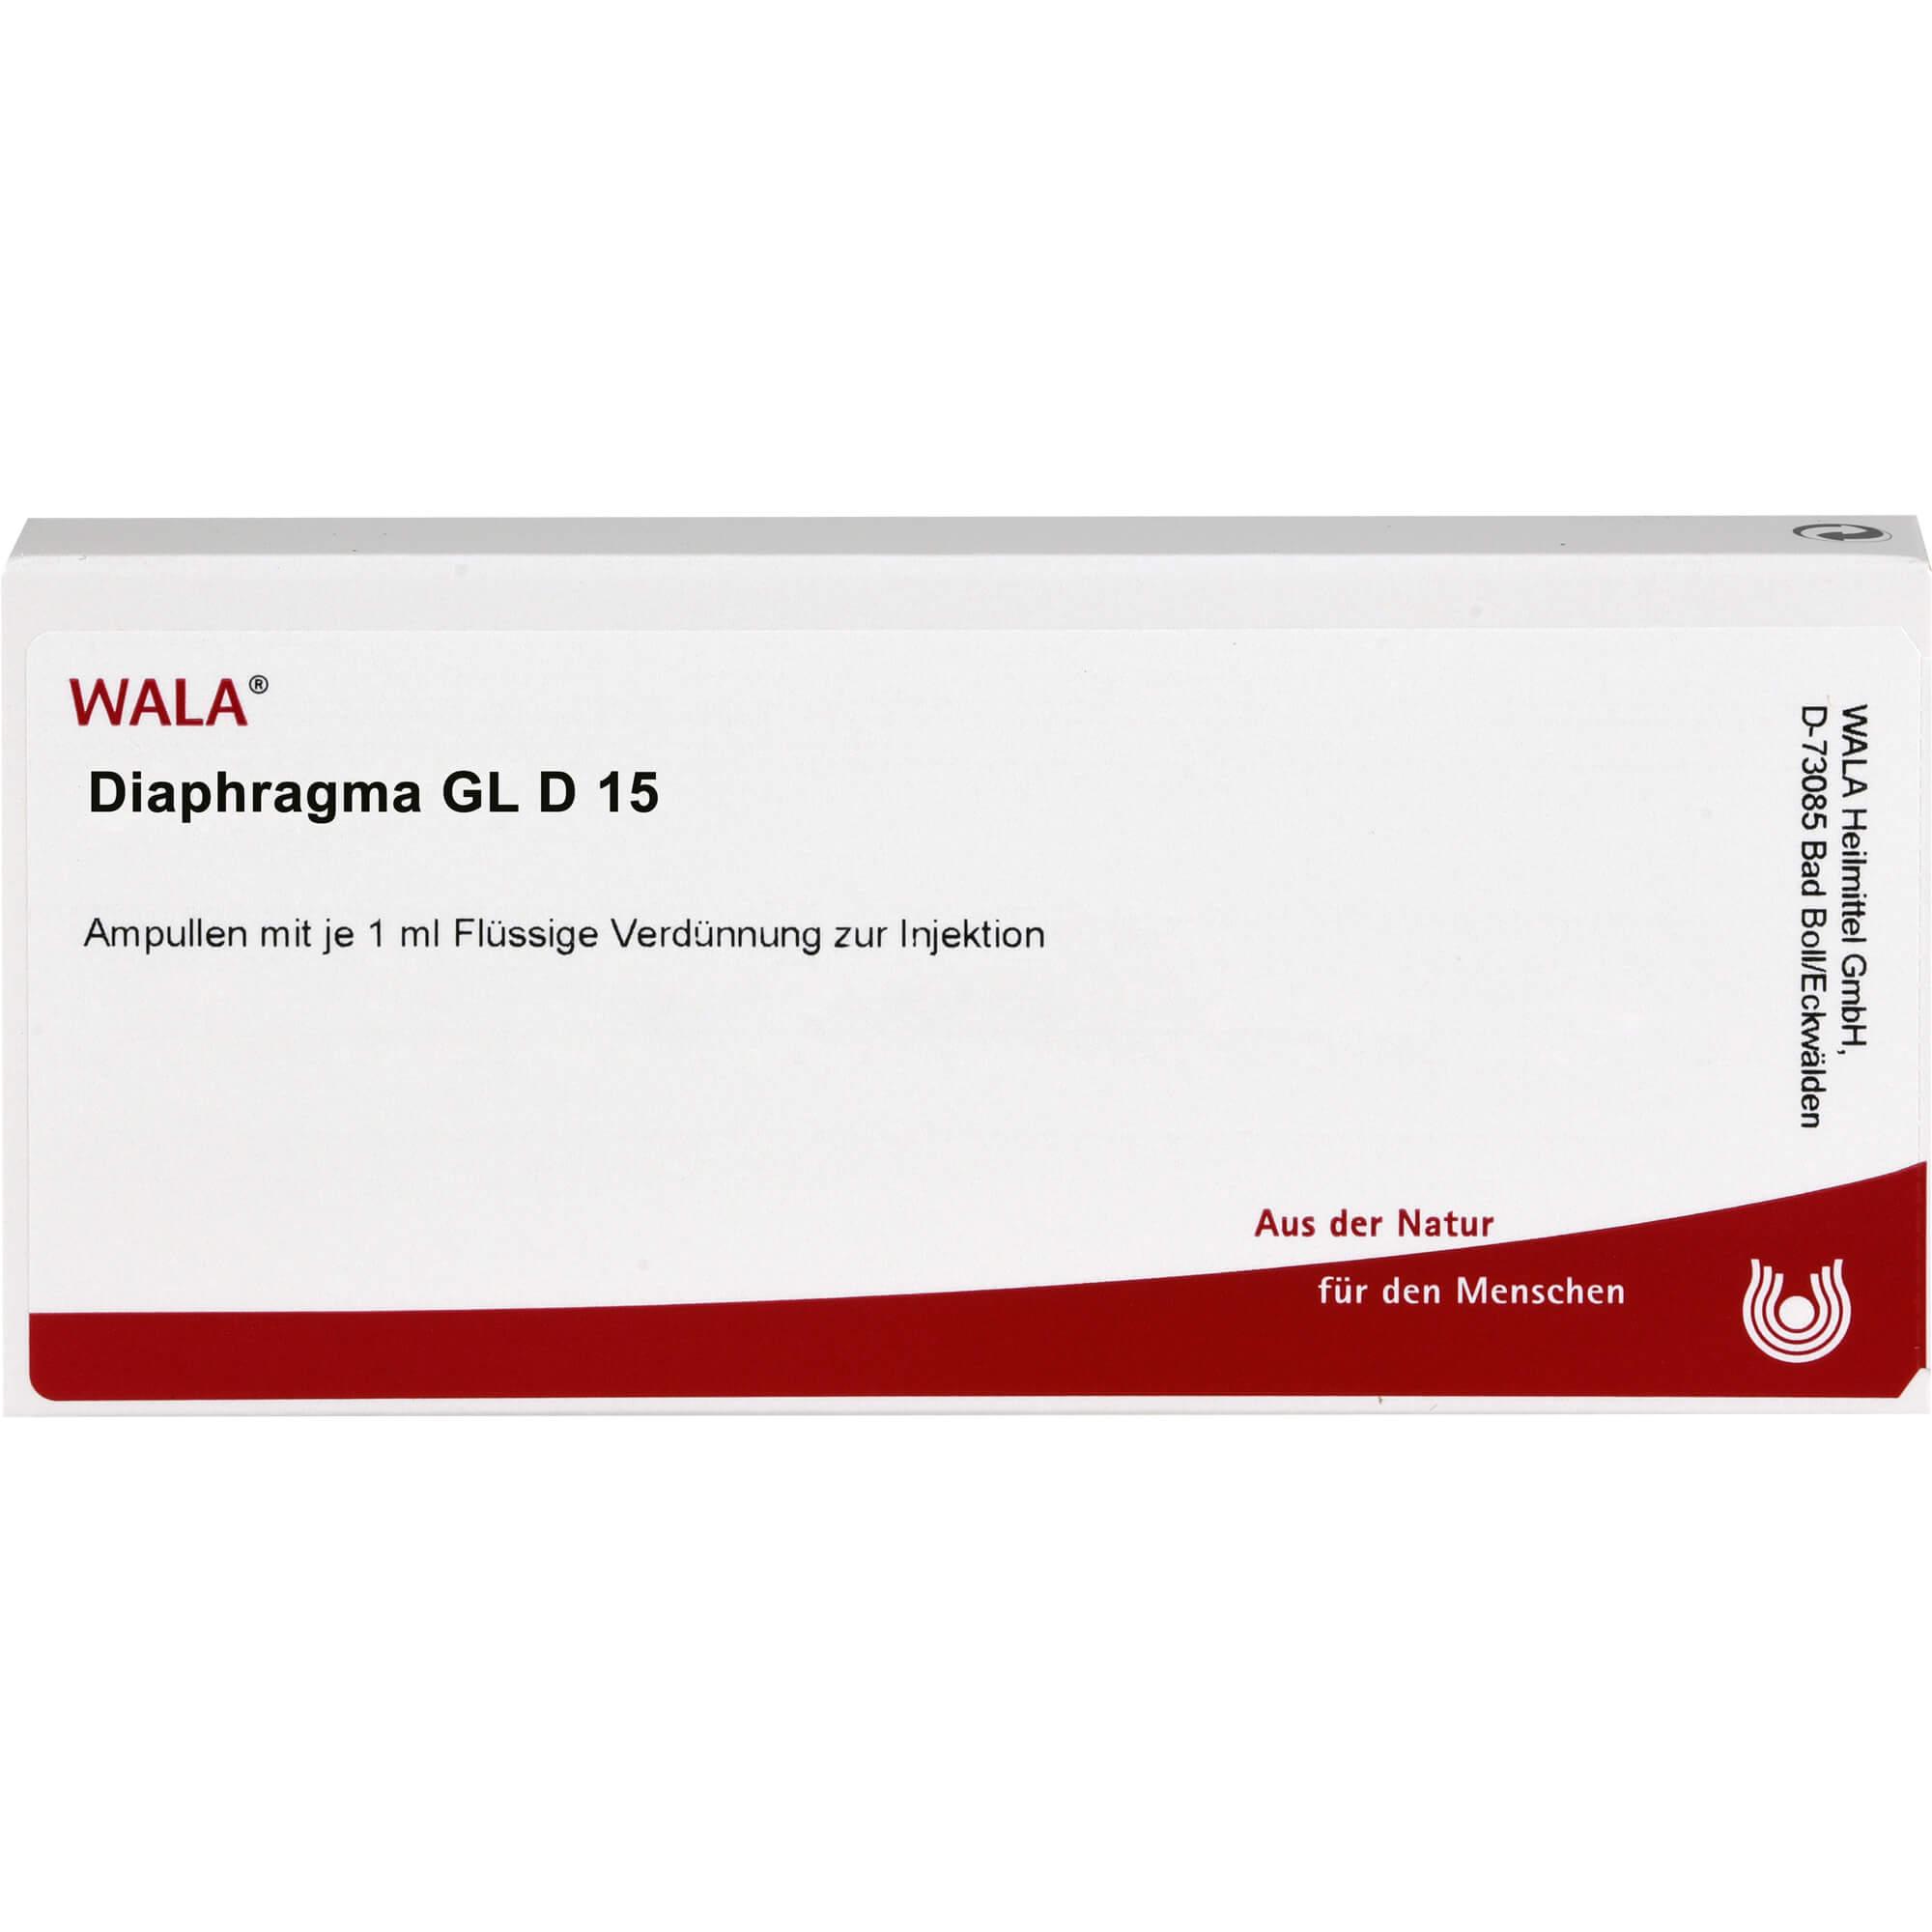 DIAPHRAGMA GL D 15 Ampullen